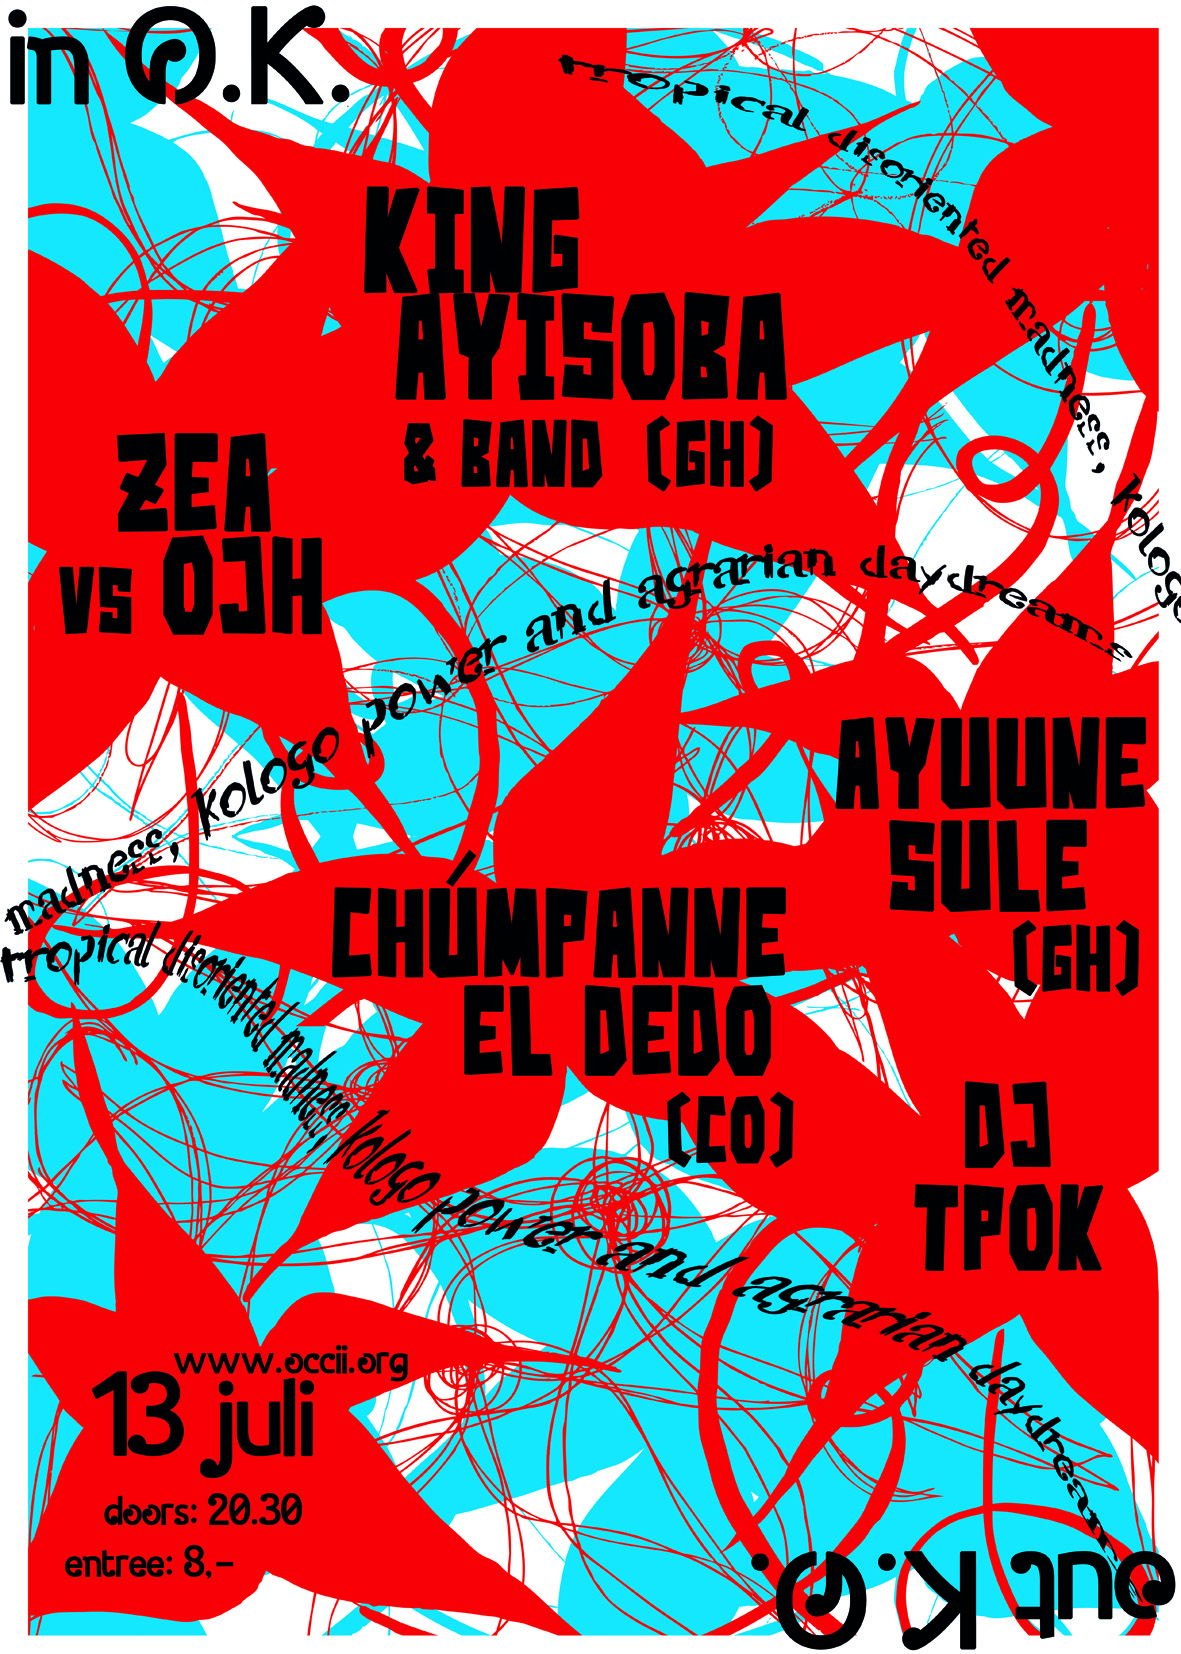 CHÚPAME EL DEDO (co) + KING AYISOBA & BAND (gh) + AYUUNE SULE (gh) + ZEA vs OJH + DJ TPOK